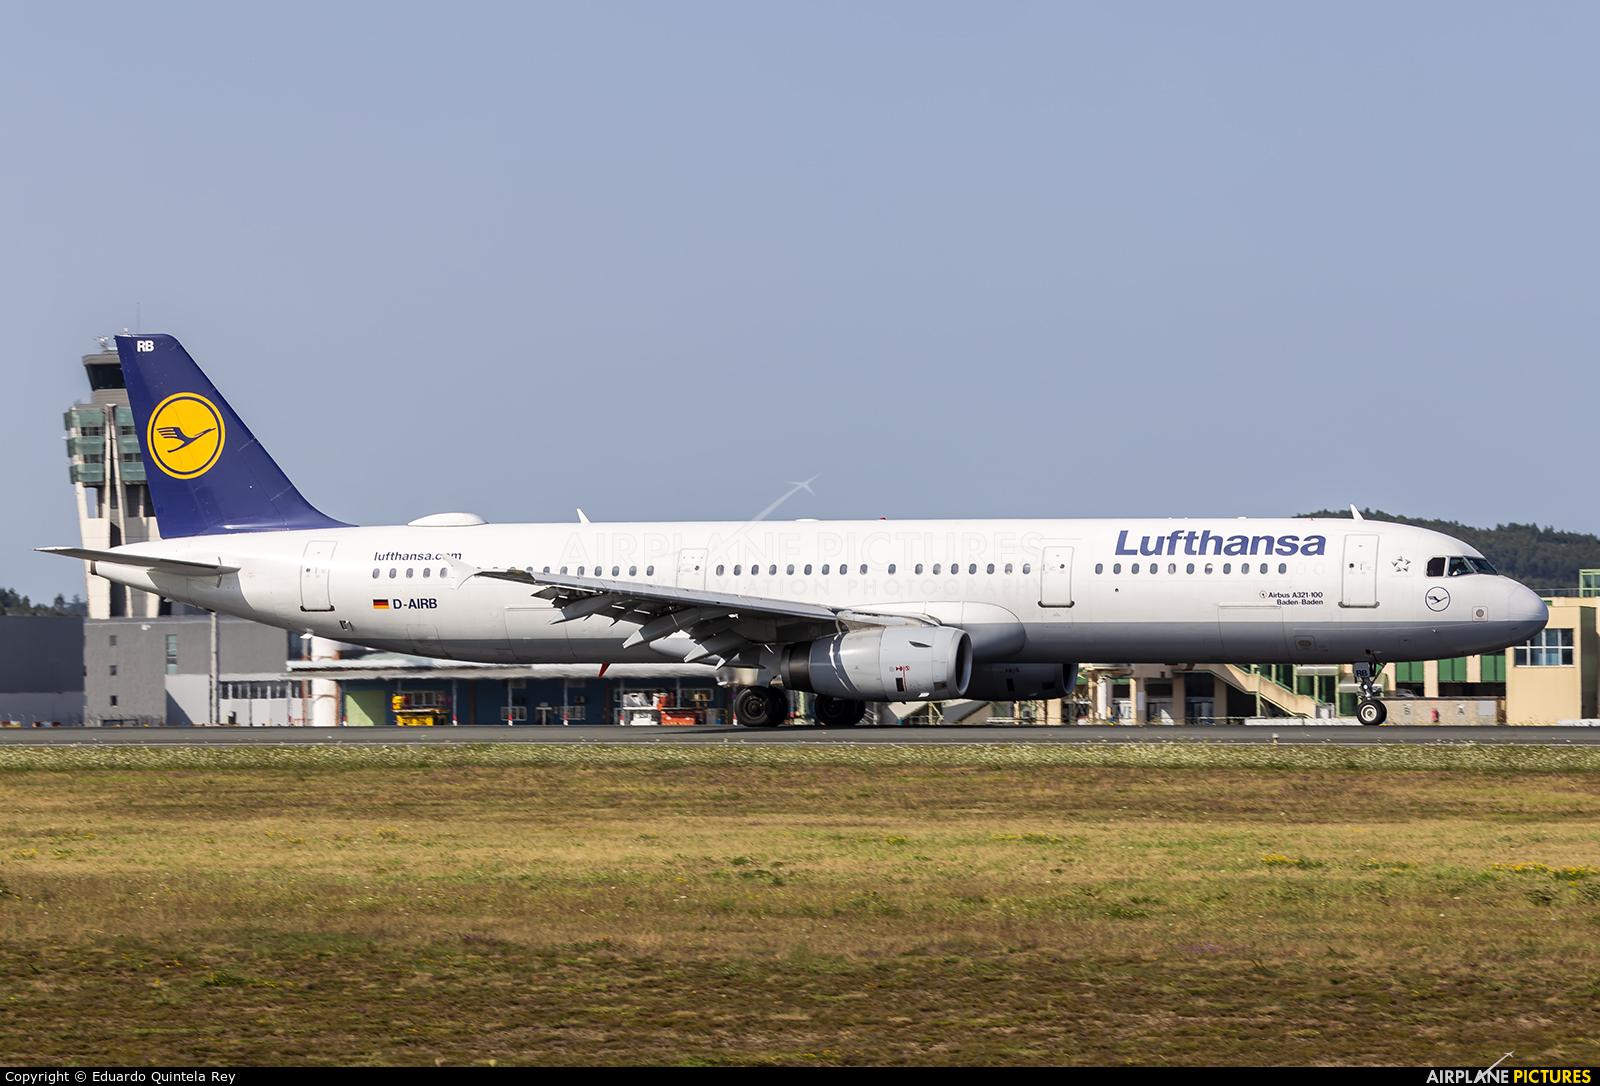 Lufthansa D-AIRB aircraft at Santiago de Compostela